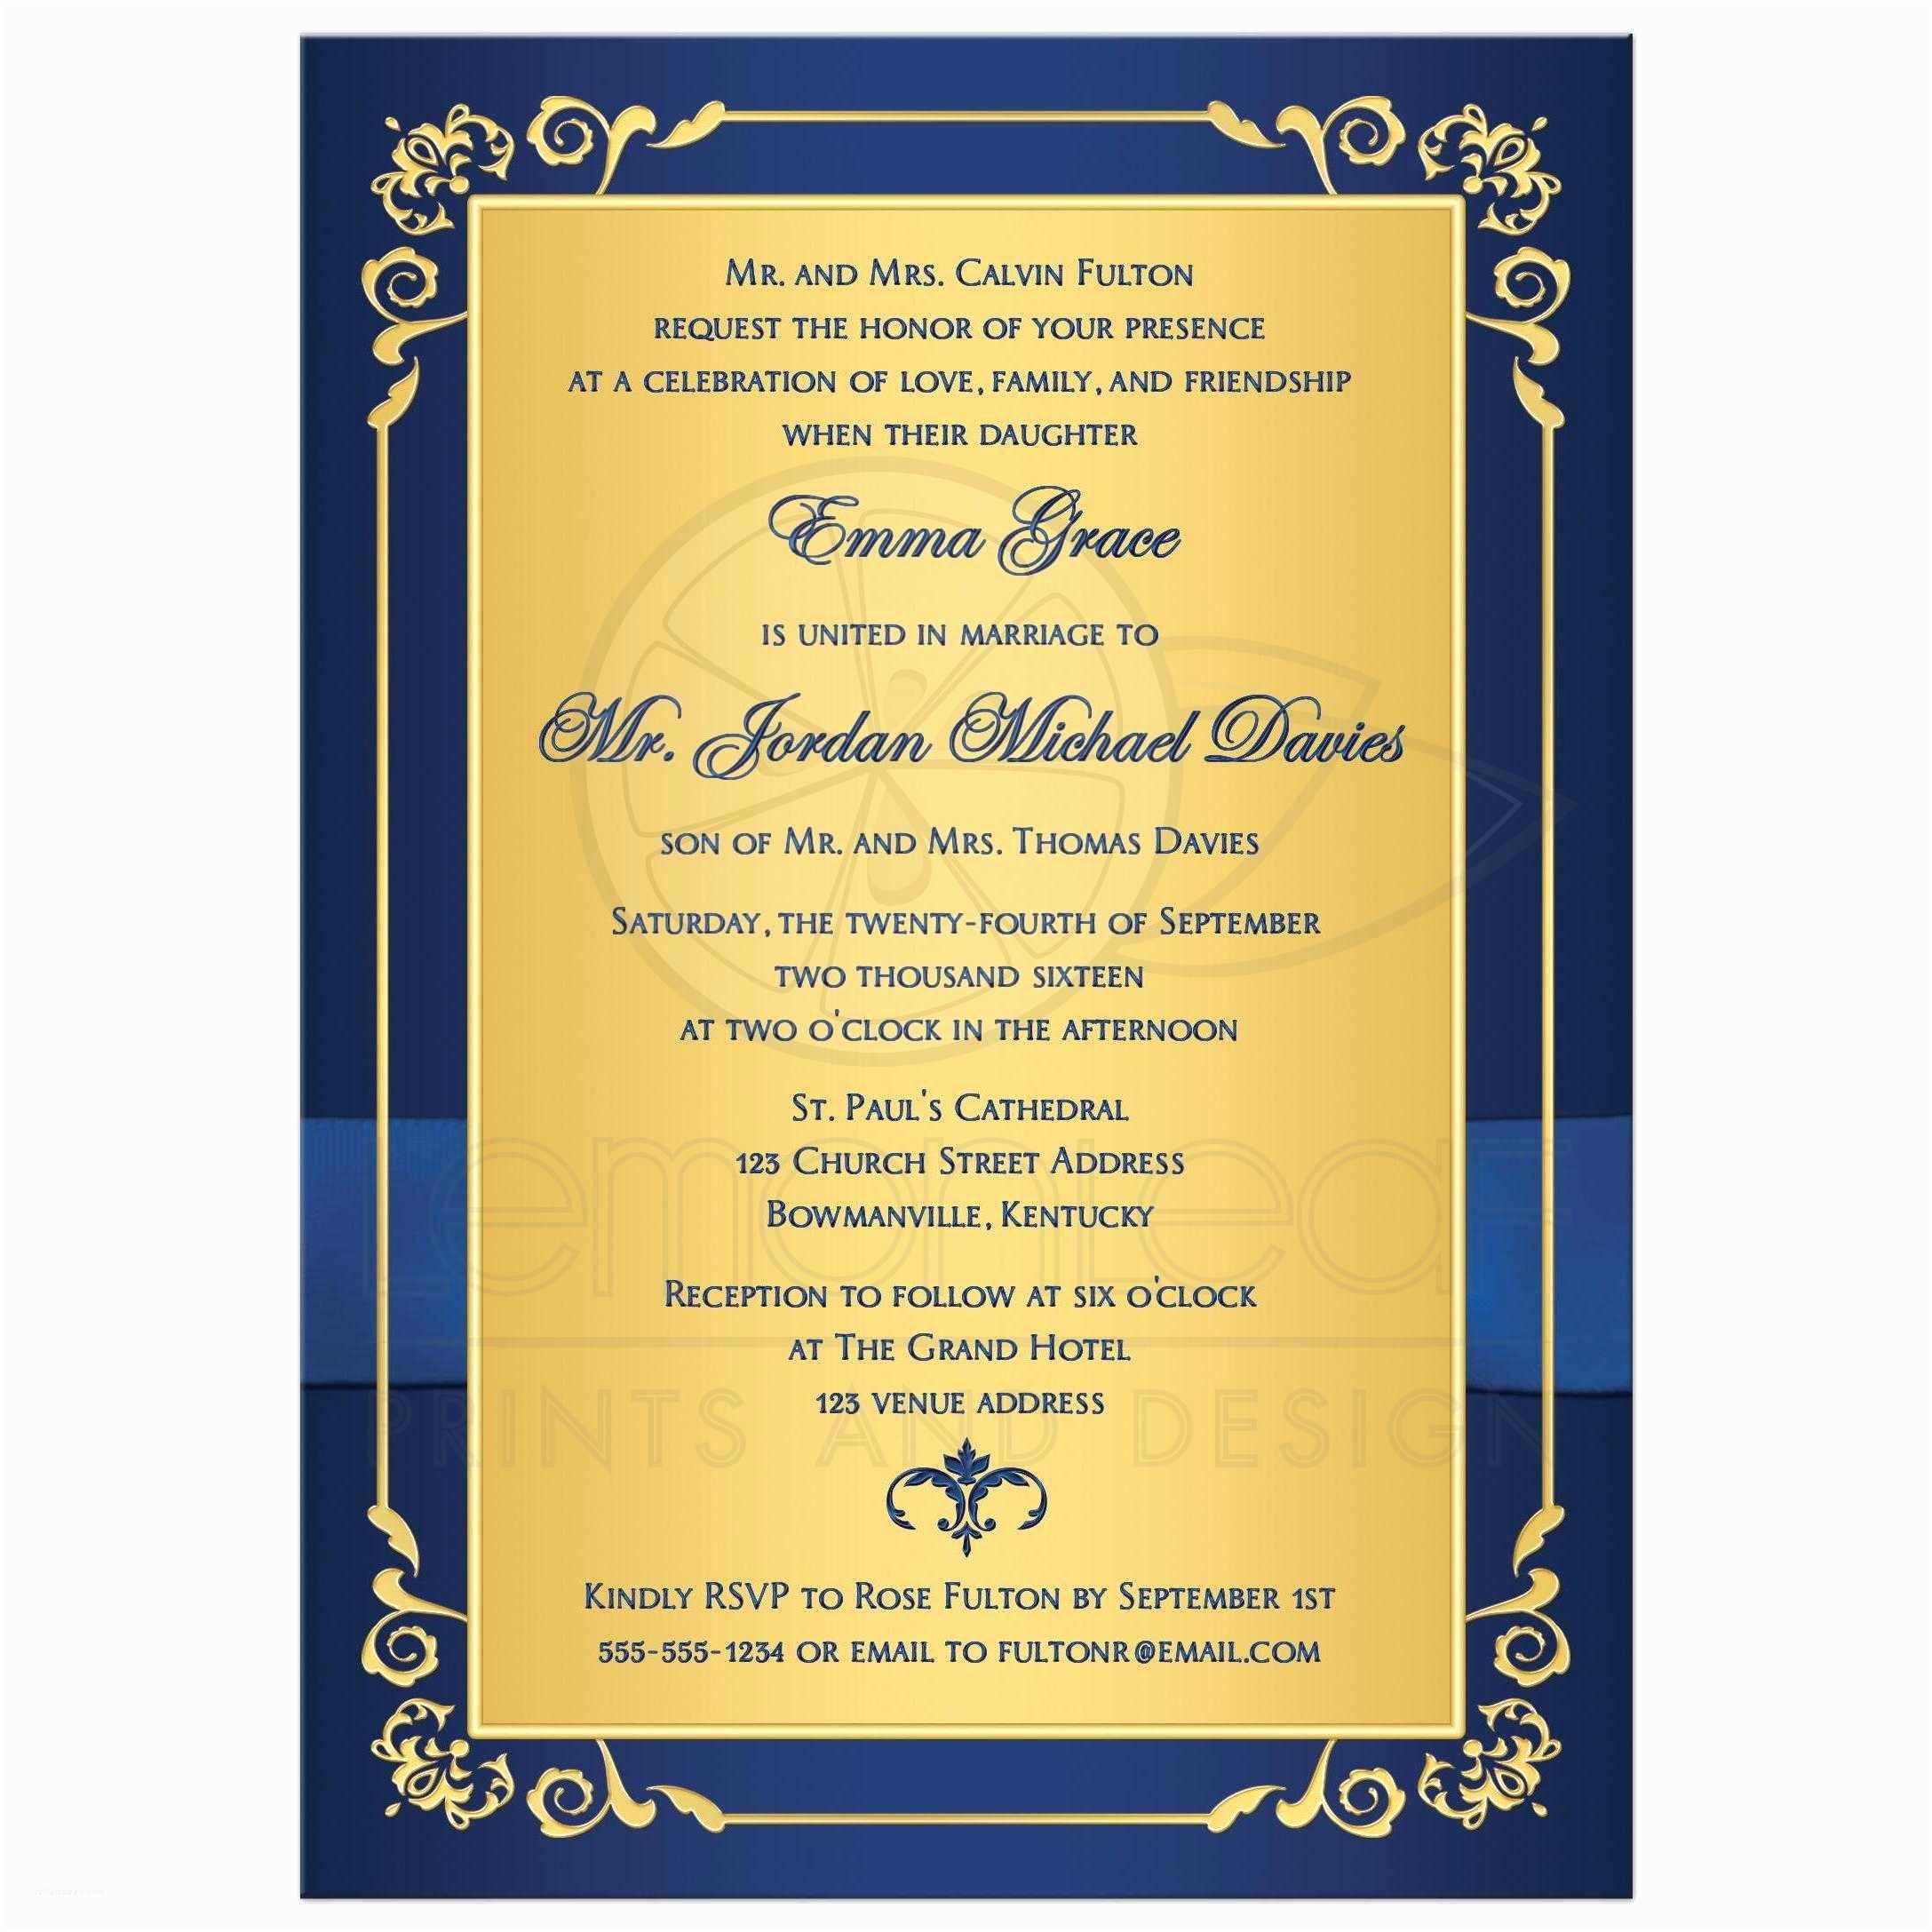 Royal Blue And Gold Wedding Invitations Wedding Invitation Royal Blue Gold